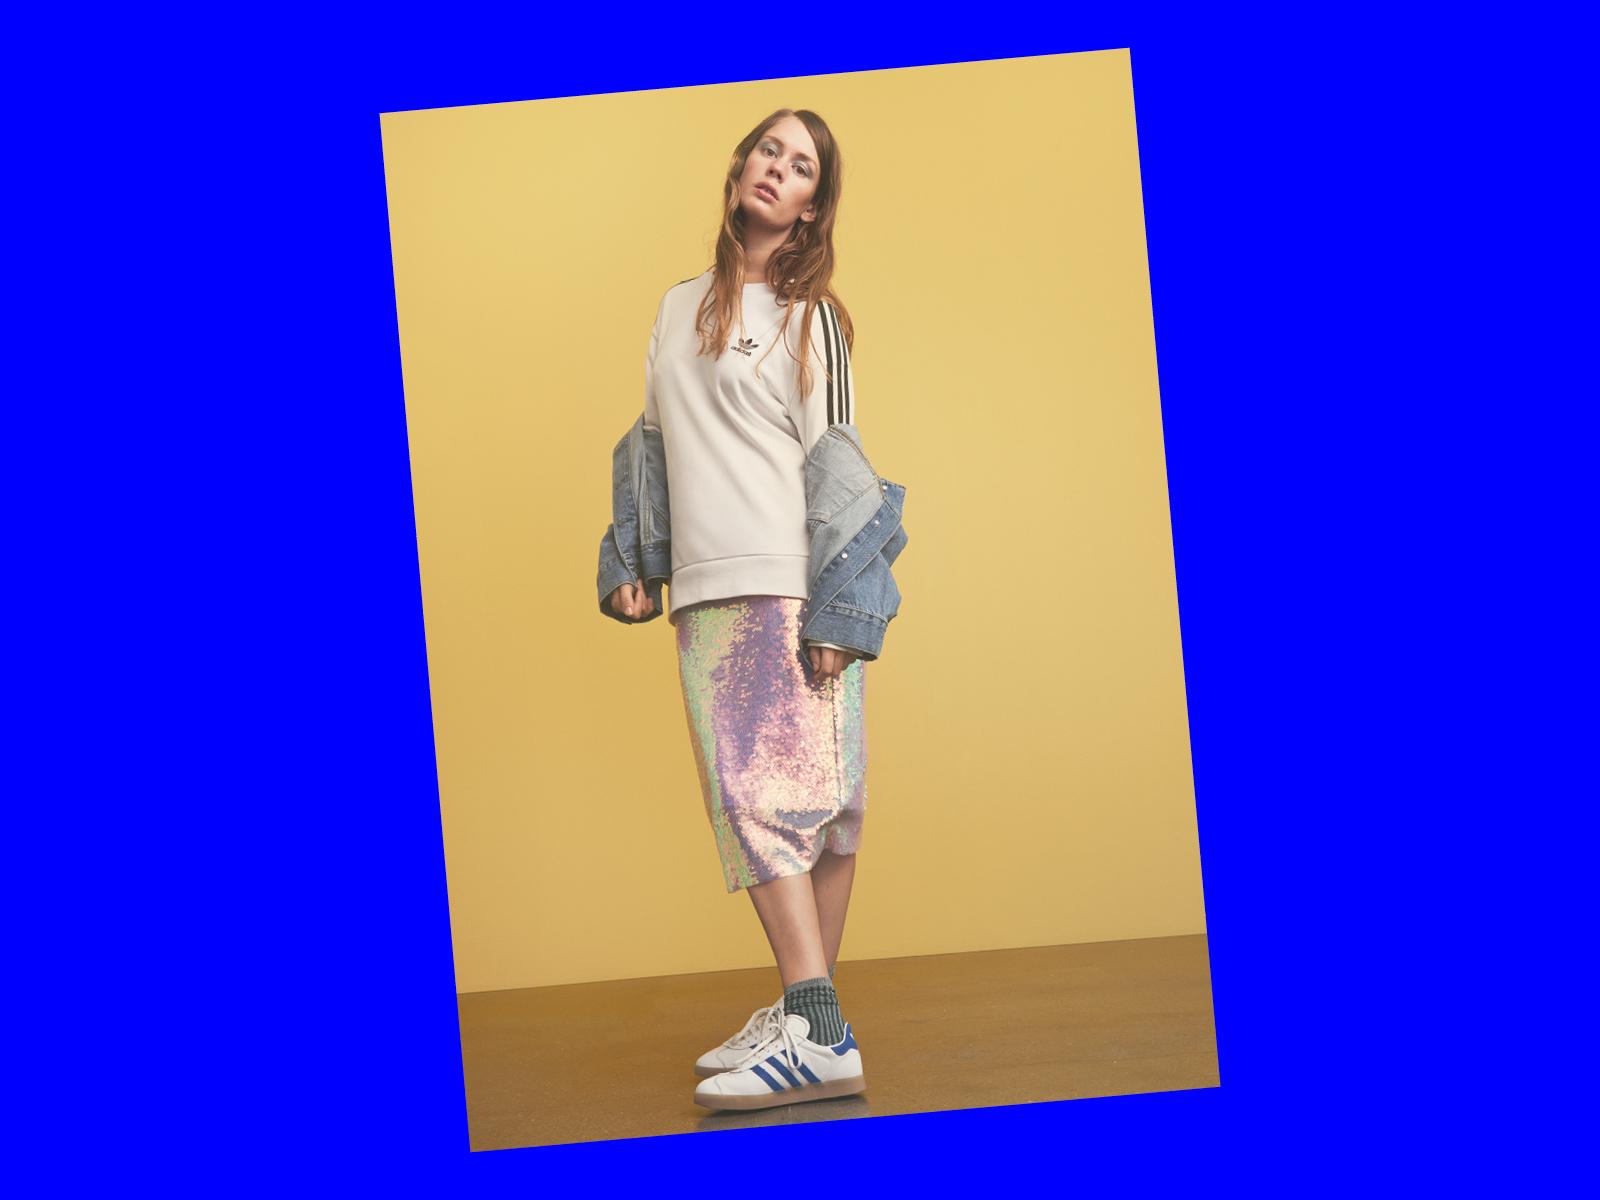 Adidas Gazelle Collage__1200x90020